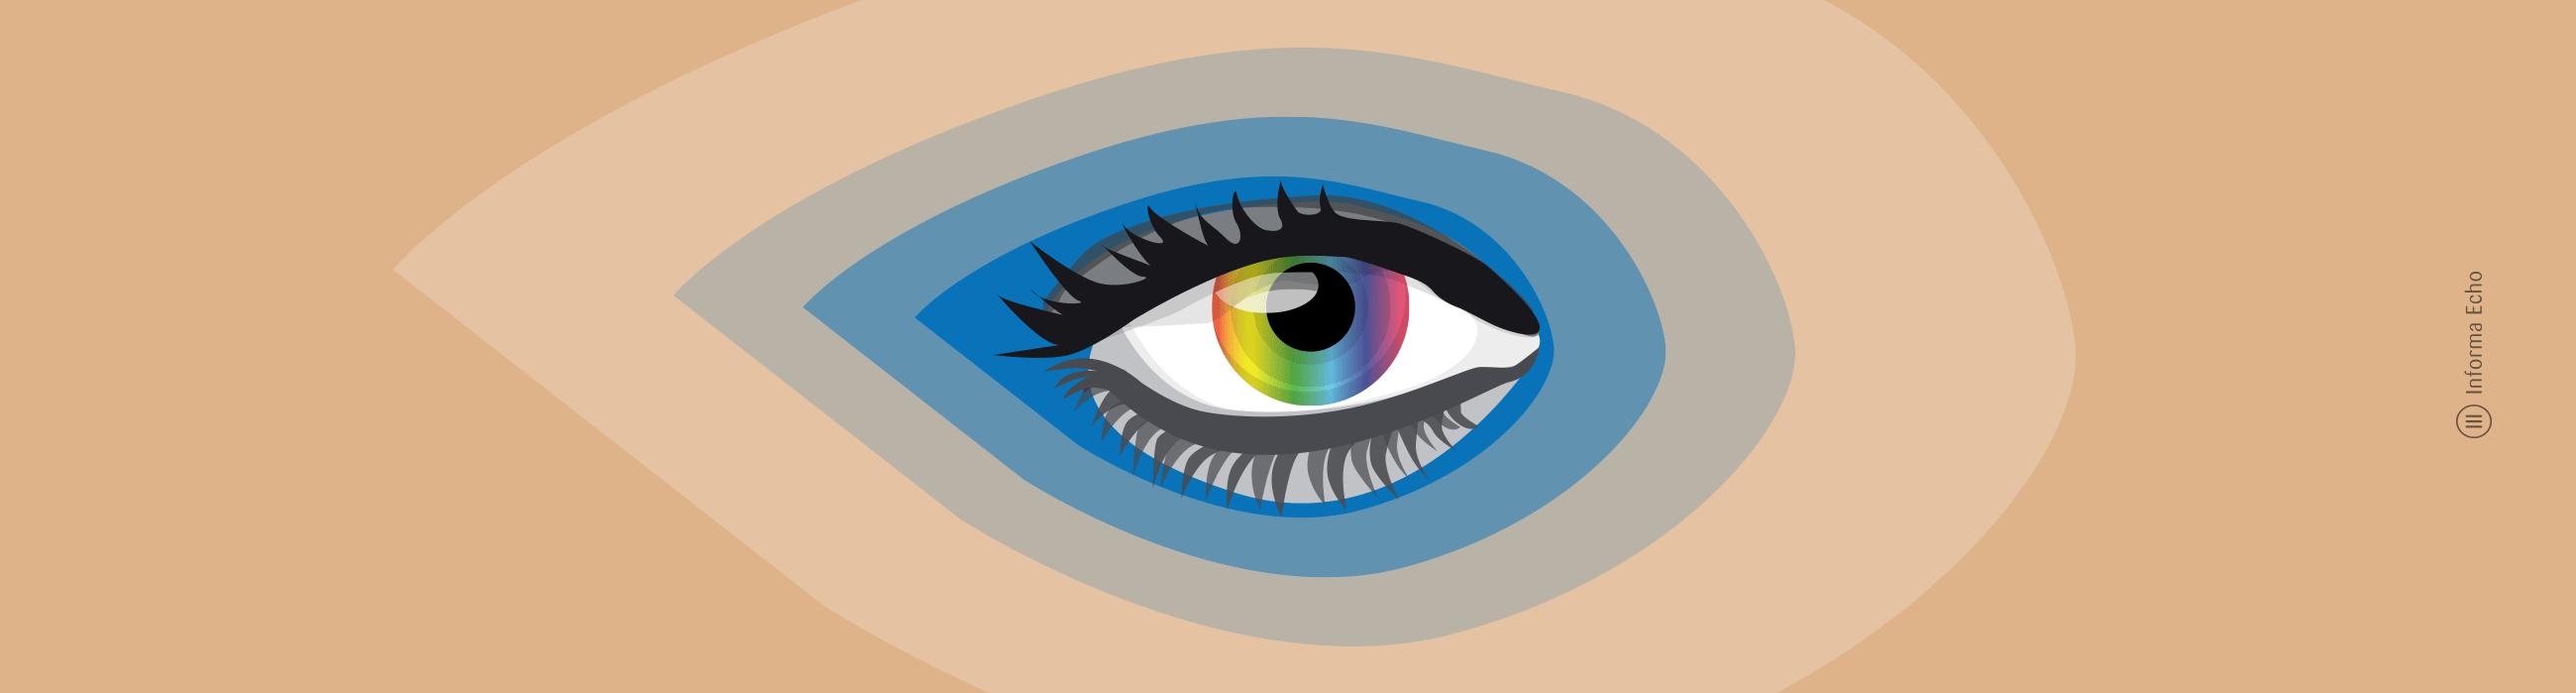 Kaj je svetloba - Vidni spektrum / PorabimanjINFO / Ilustracija: Branko Baćović